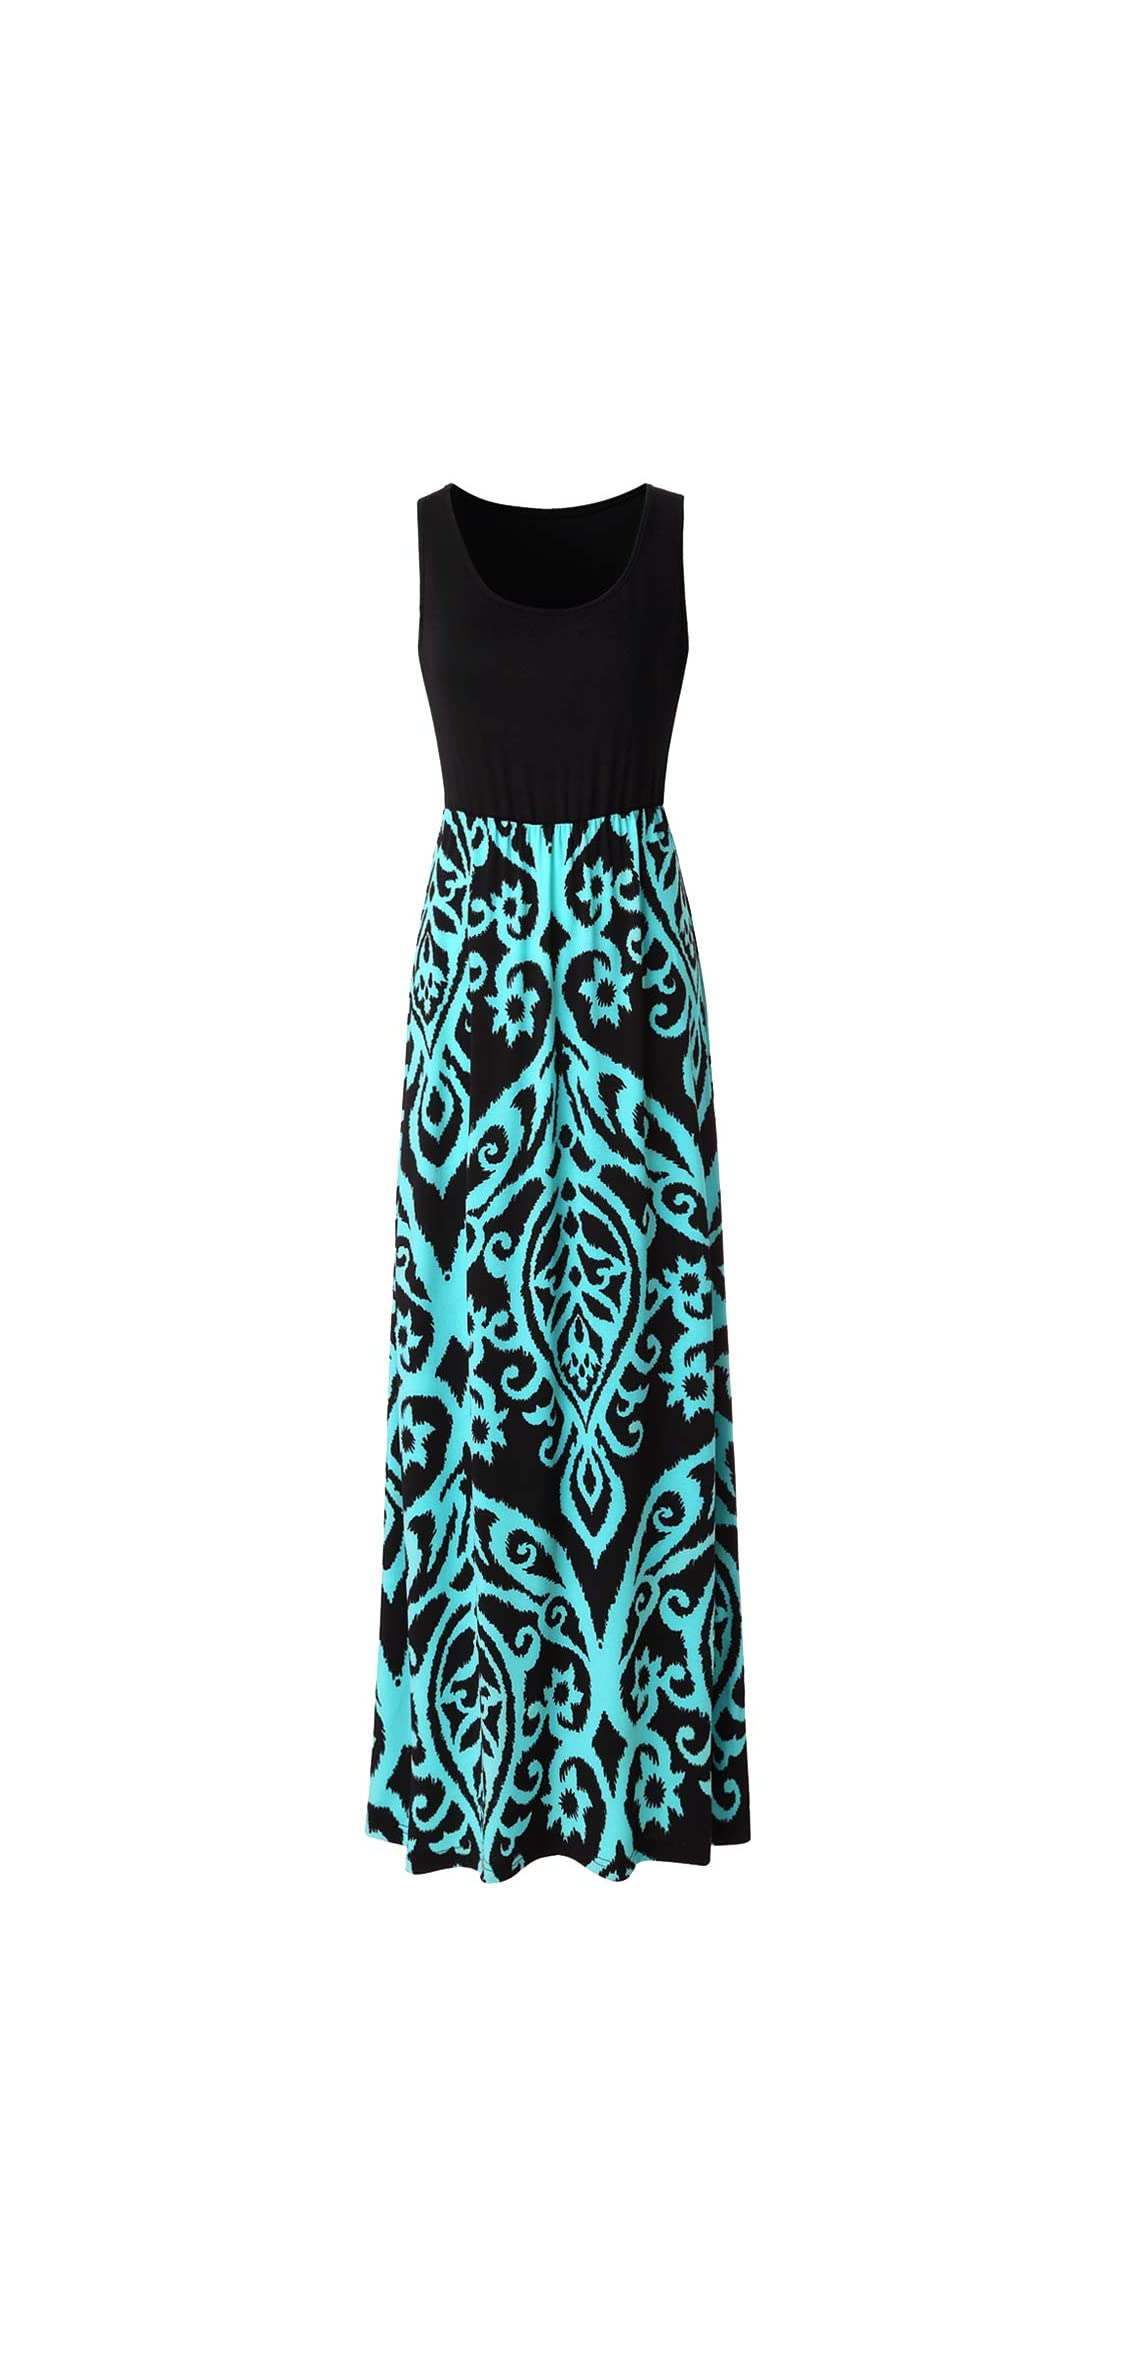 Womens Summer Contrast Sleeveless Tank Top Floral Print